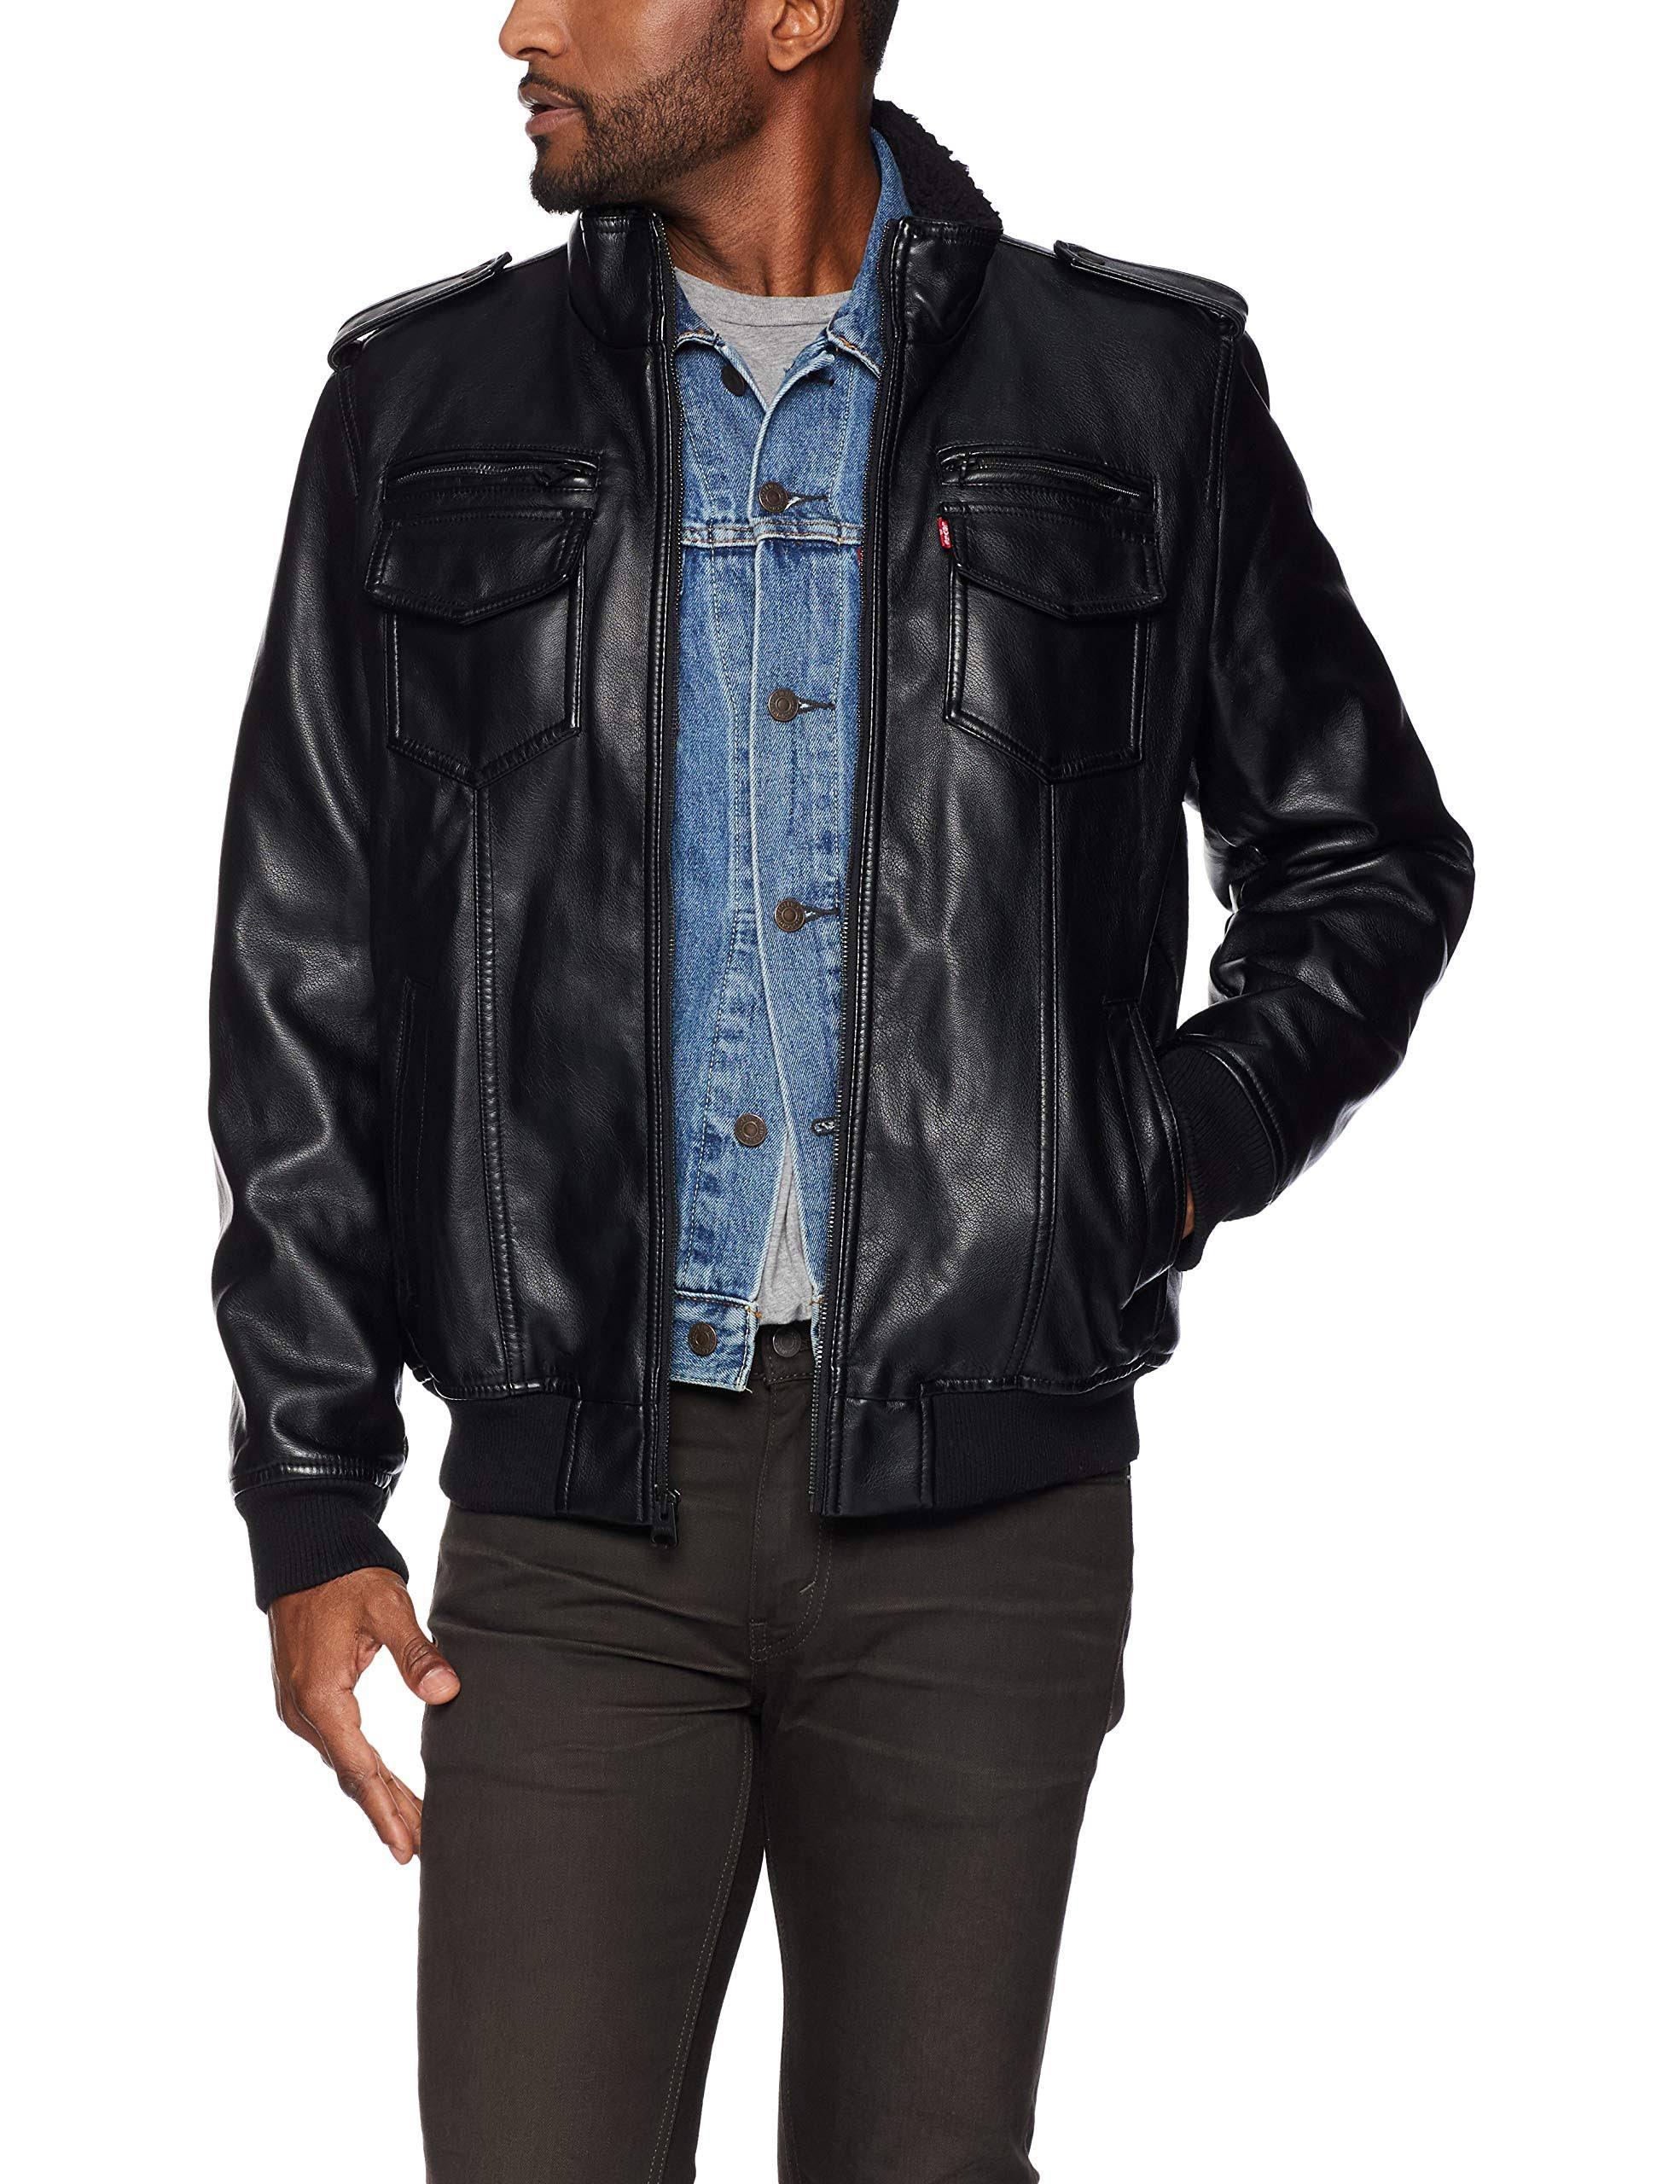 Ciervo Leather Vintage Aviador Negro Faux Bombardero Hombres Levi's Forrado w4OEqxB